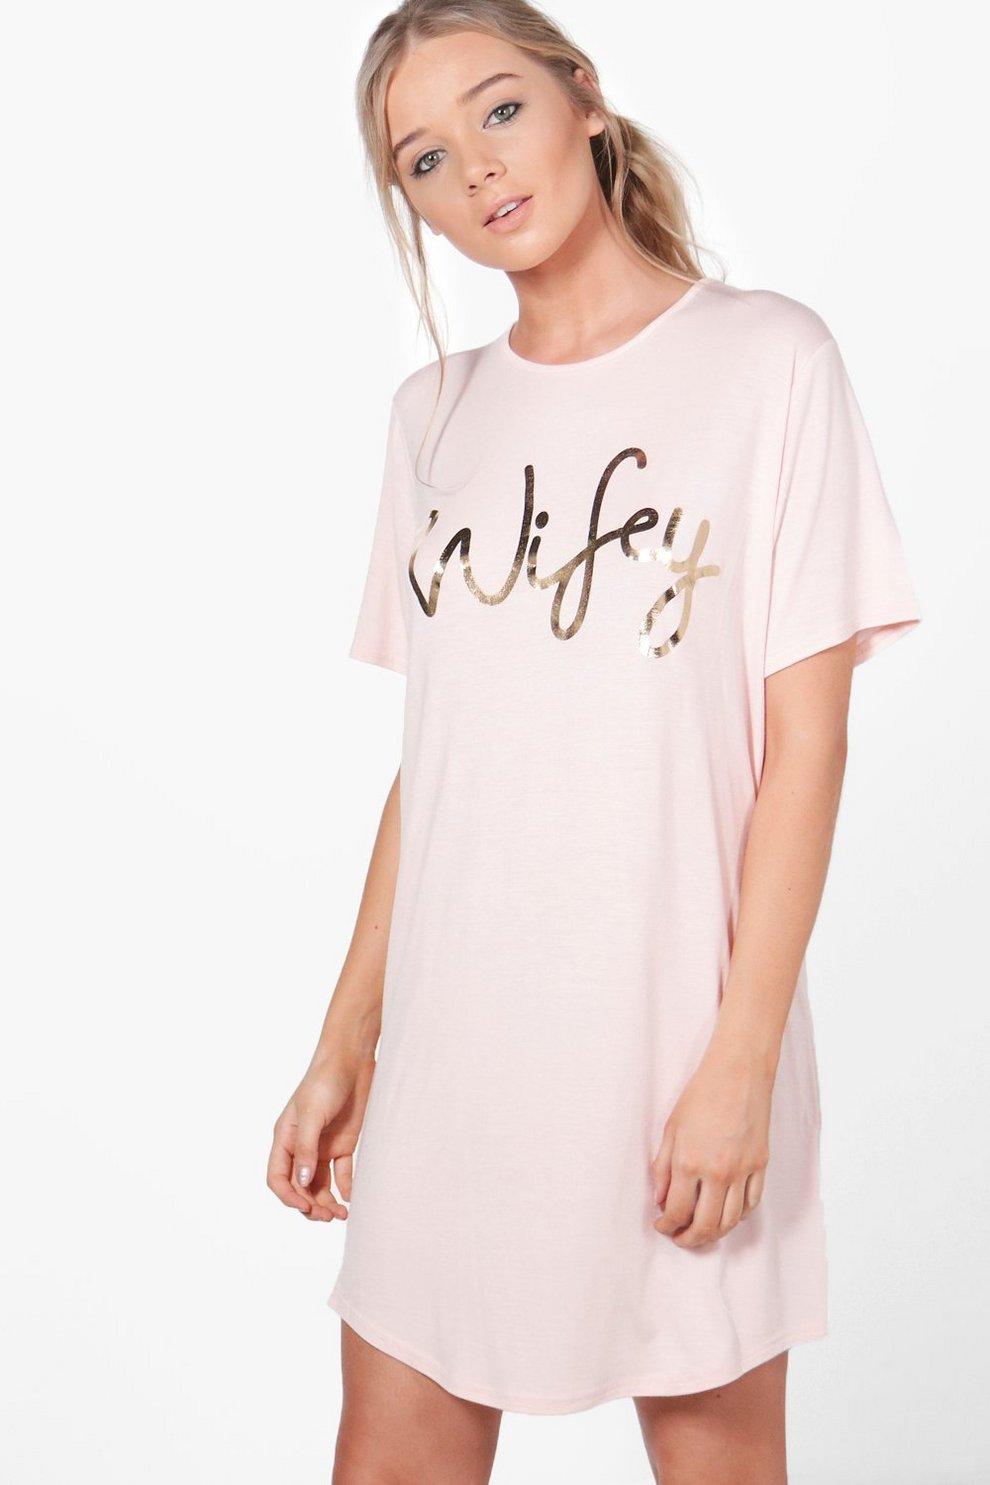 50 style dresses nzz